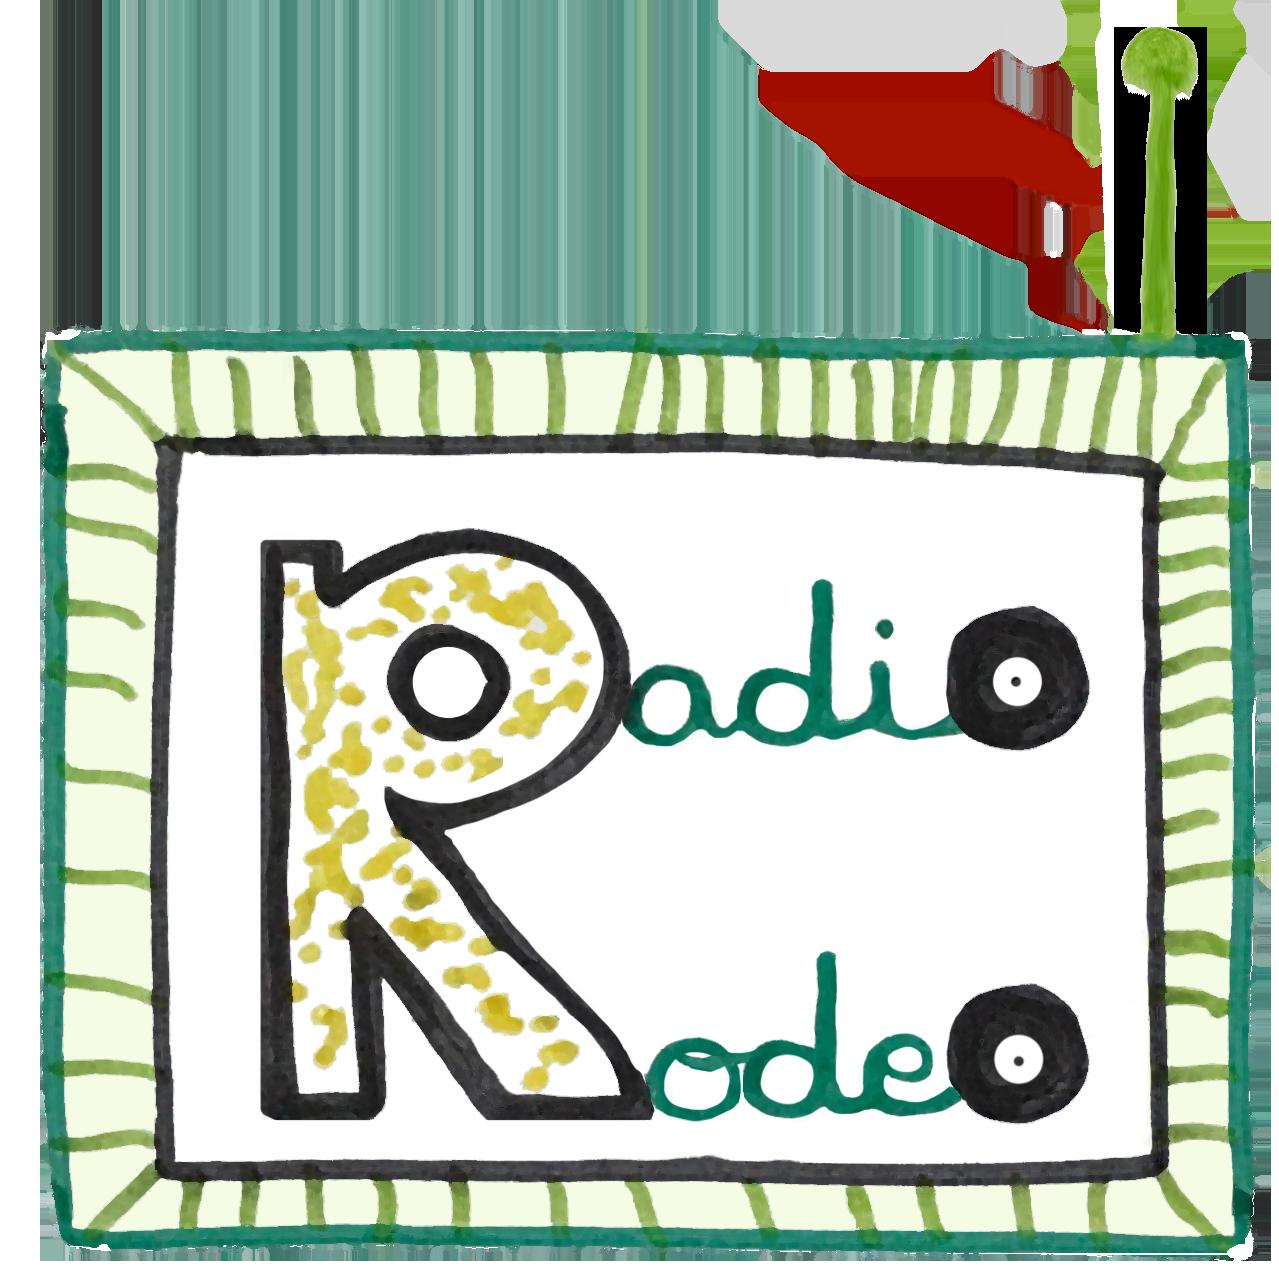 Tu emisora de radio educativa